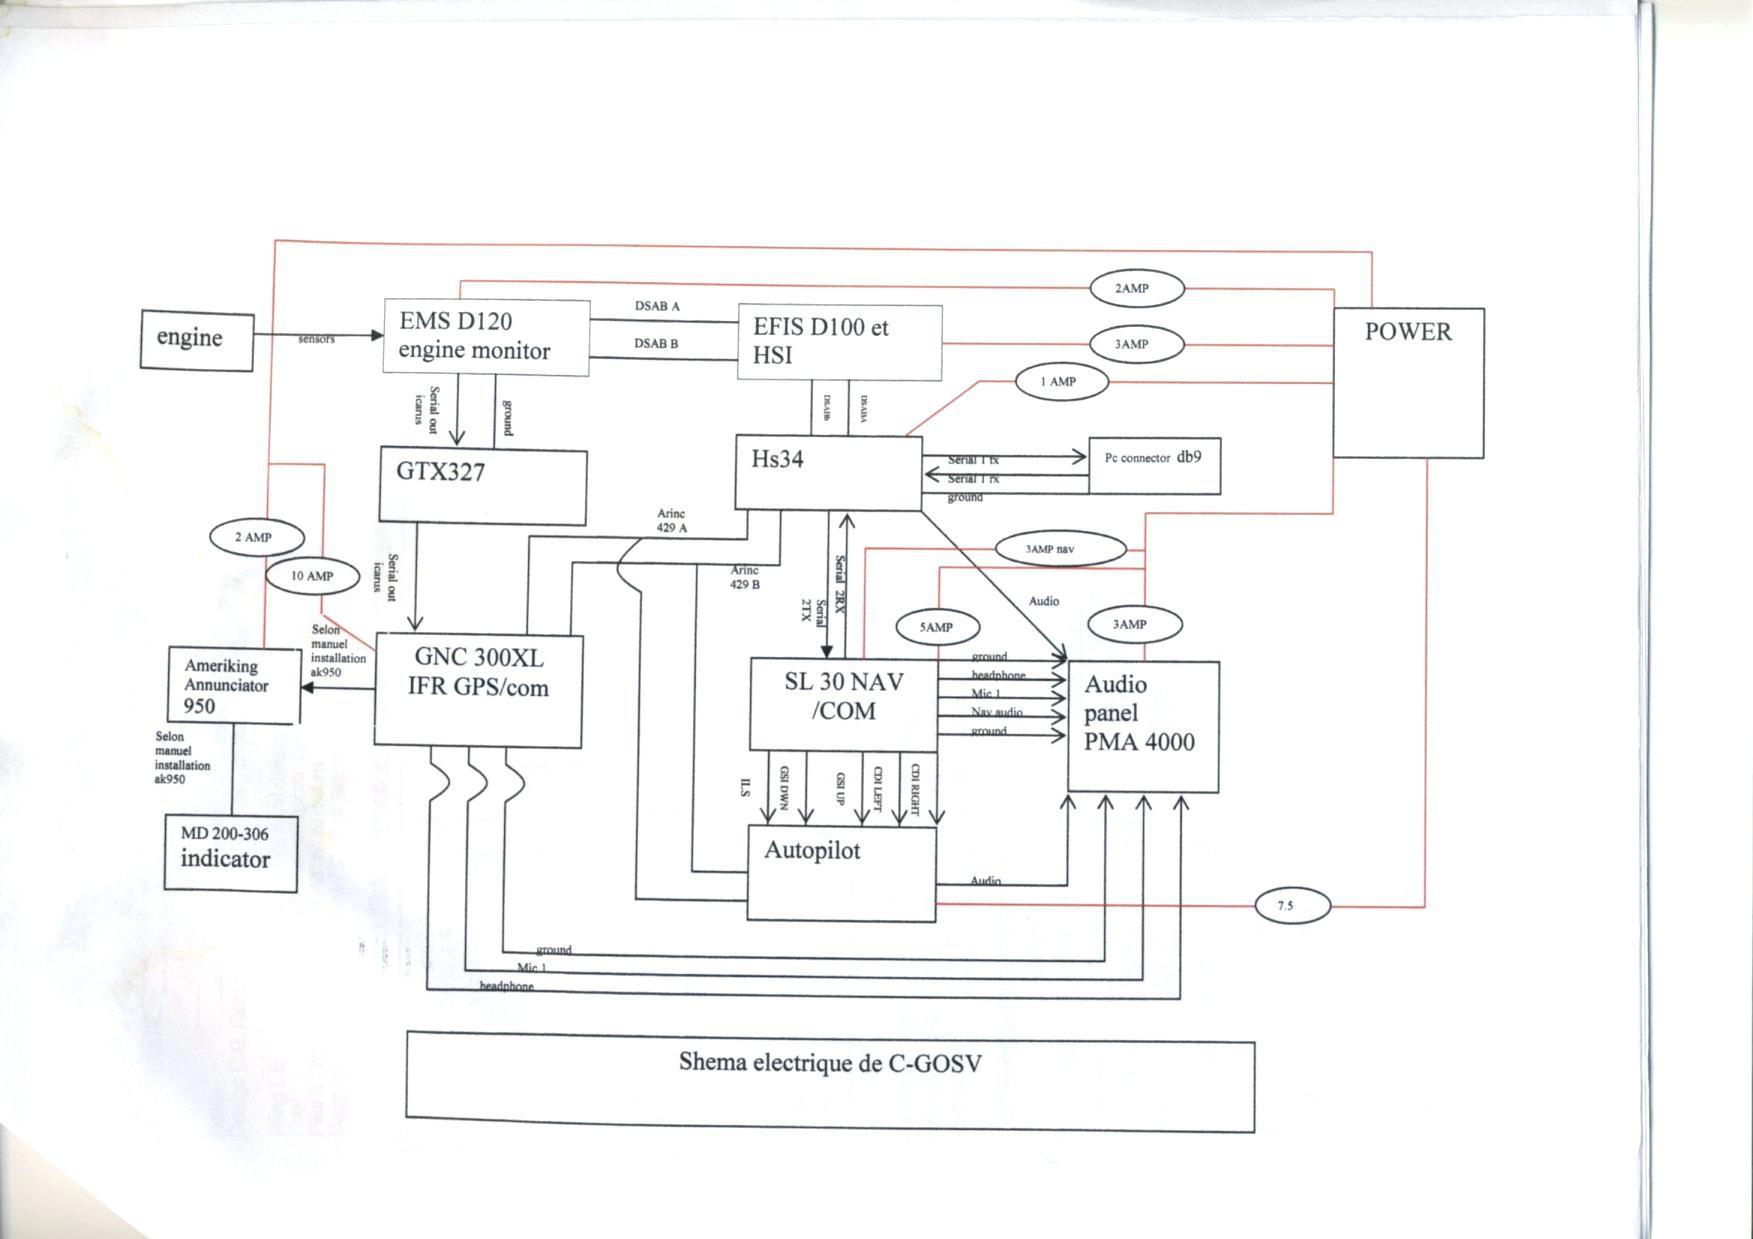 Garmin Usb Wiring Diagram - Wiring Diagrams on